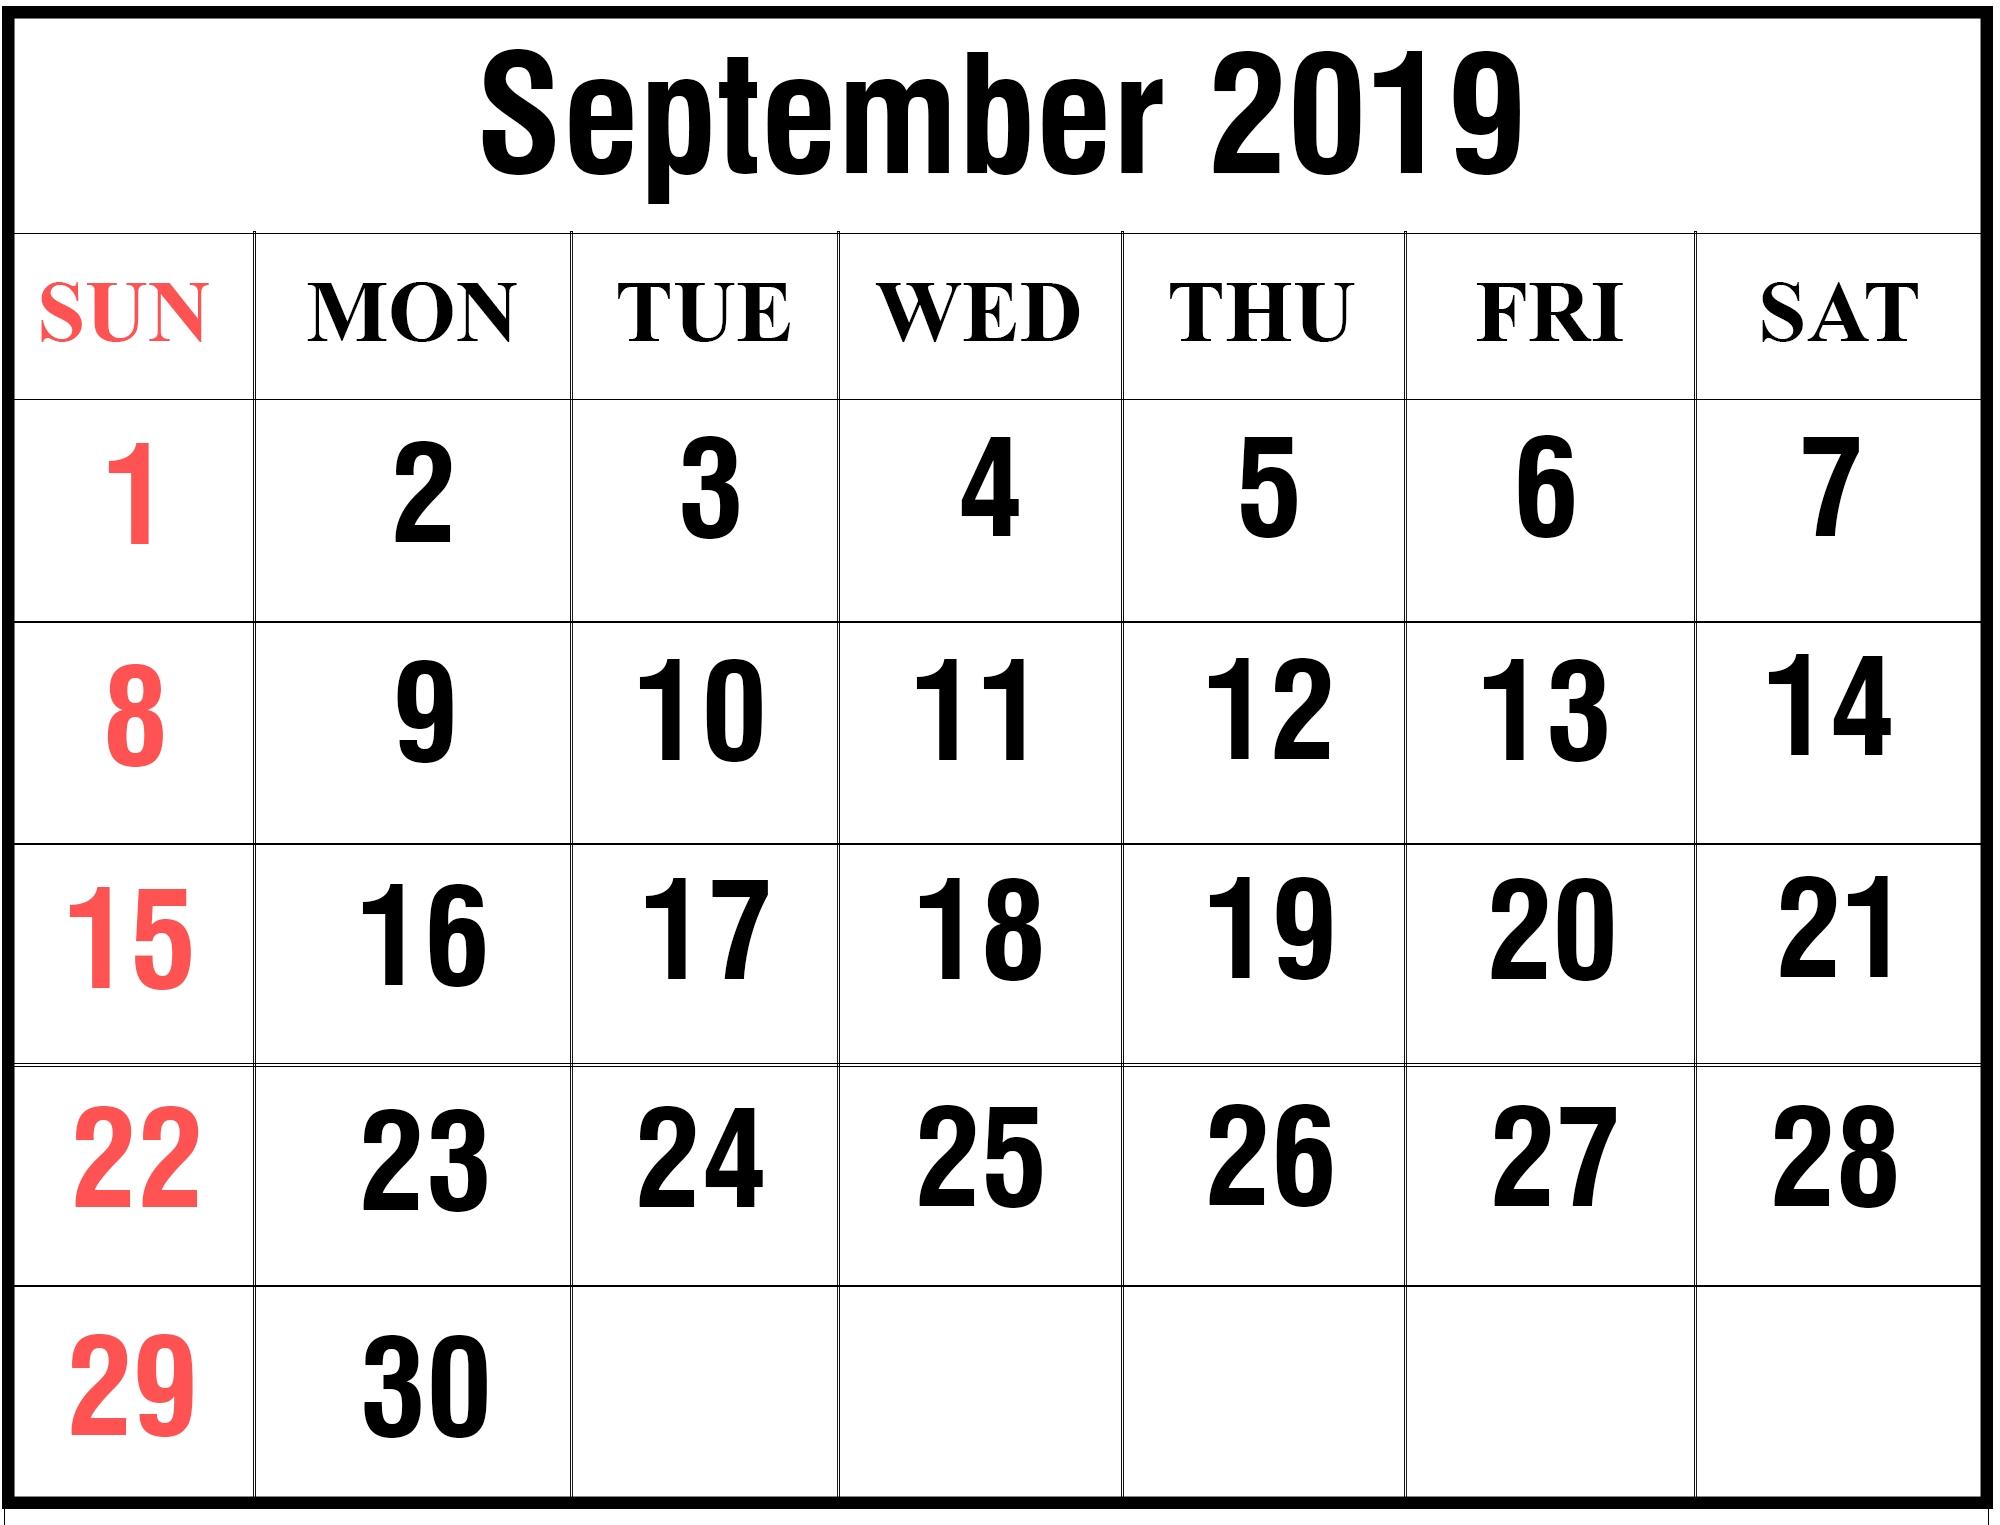 September 2019 Calendar Printable Large Print Sheet - Latest